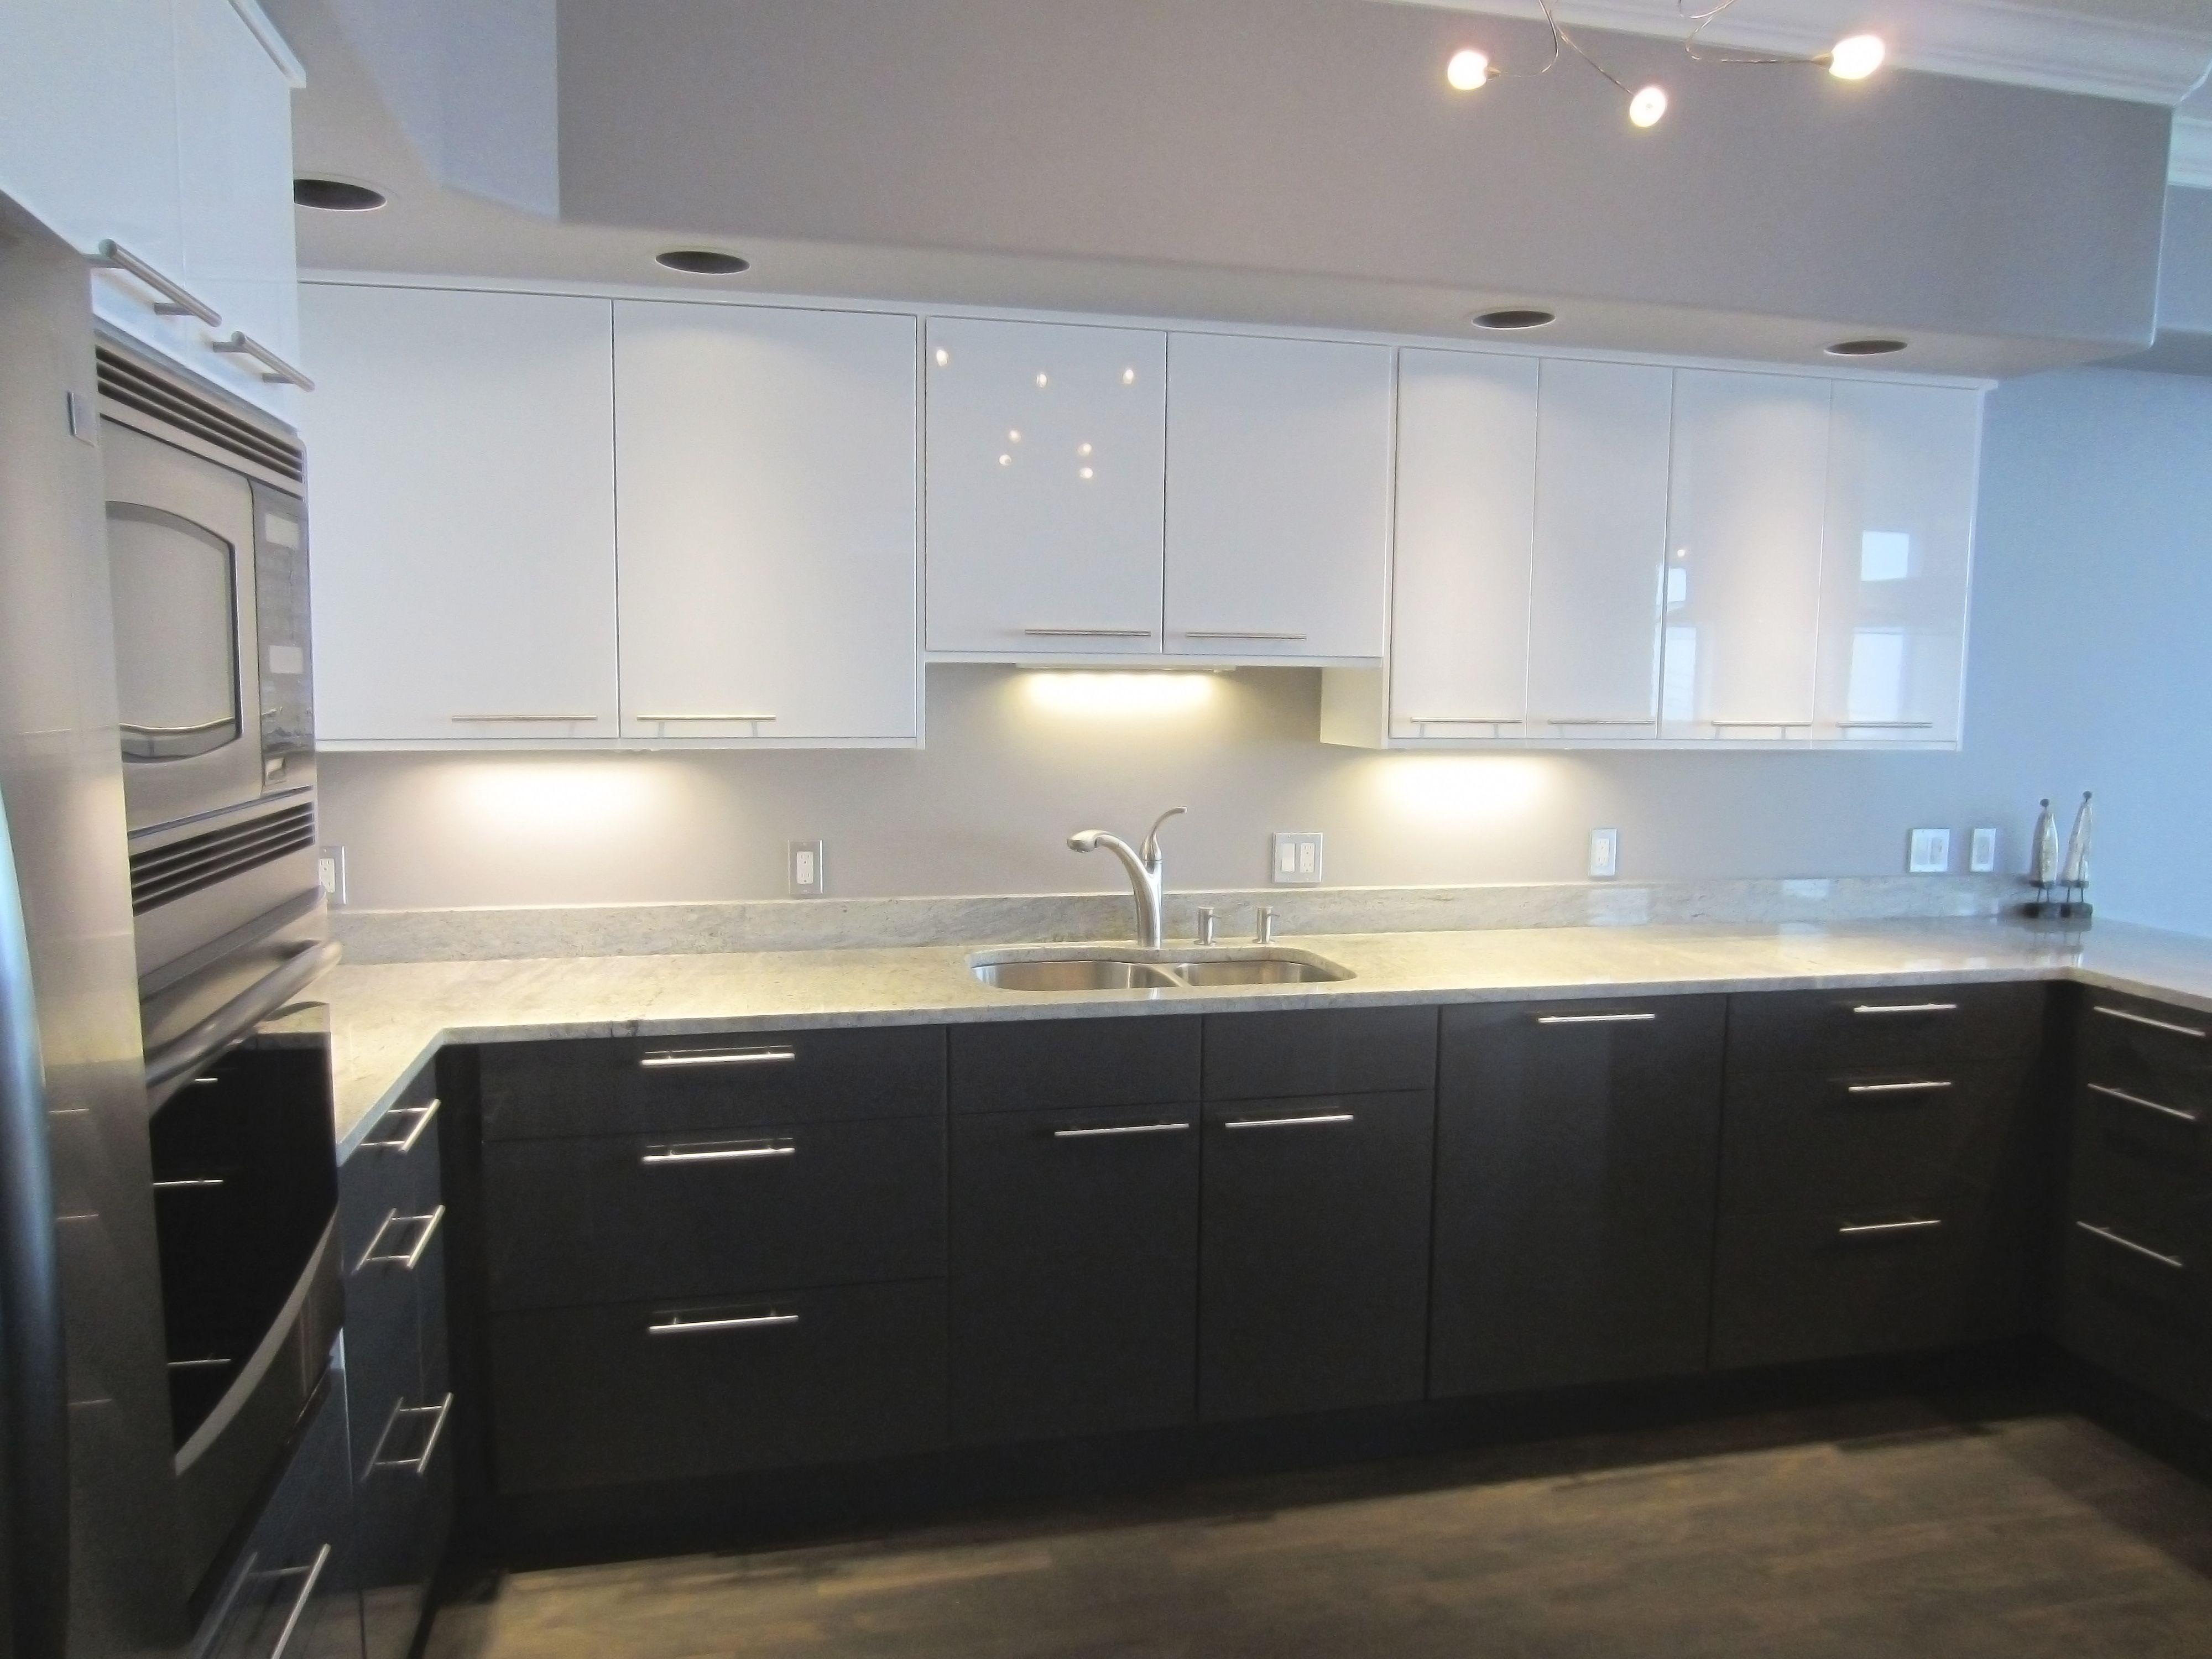 Küchenrückwand Ikea ~ Kchen ikea best ikea kitchen lighting ideas